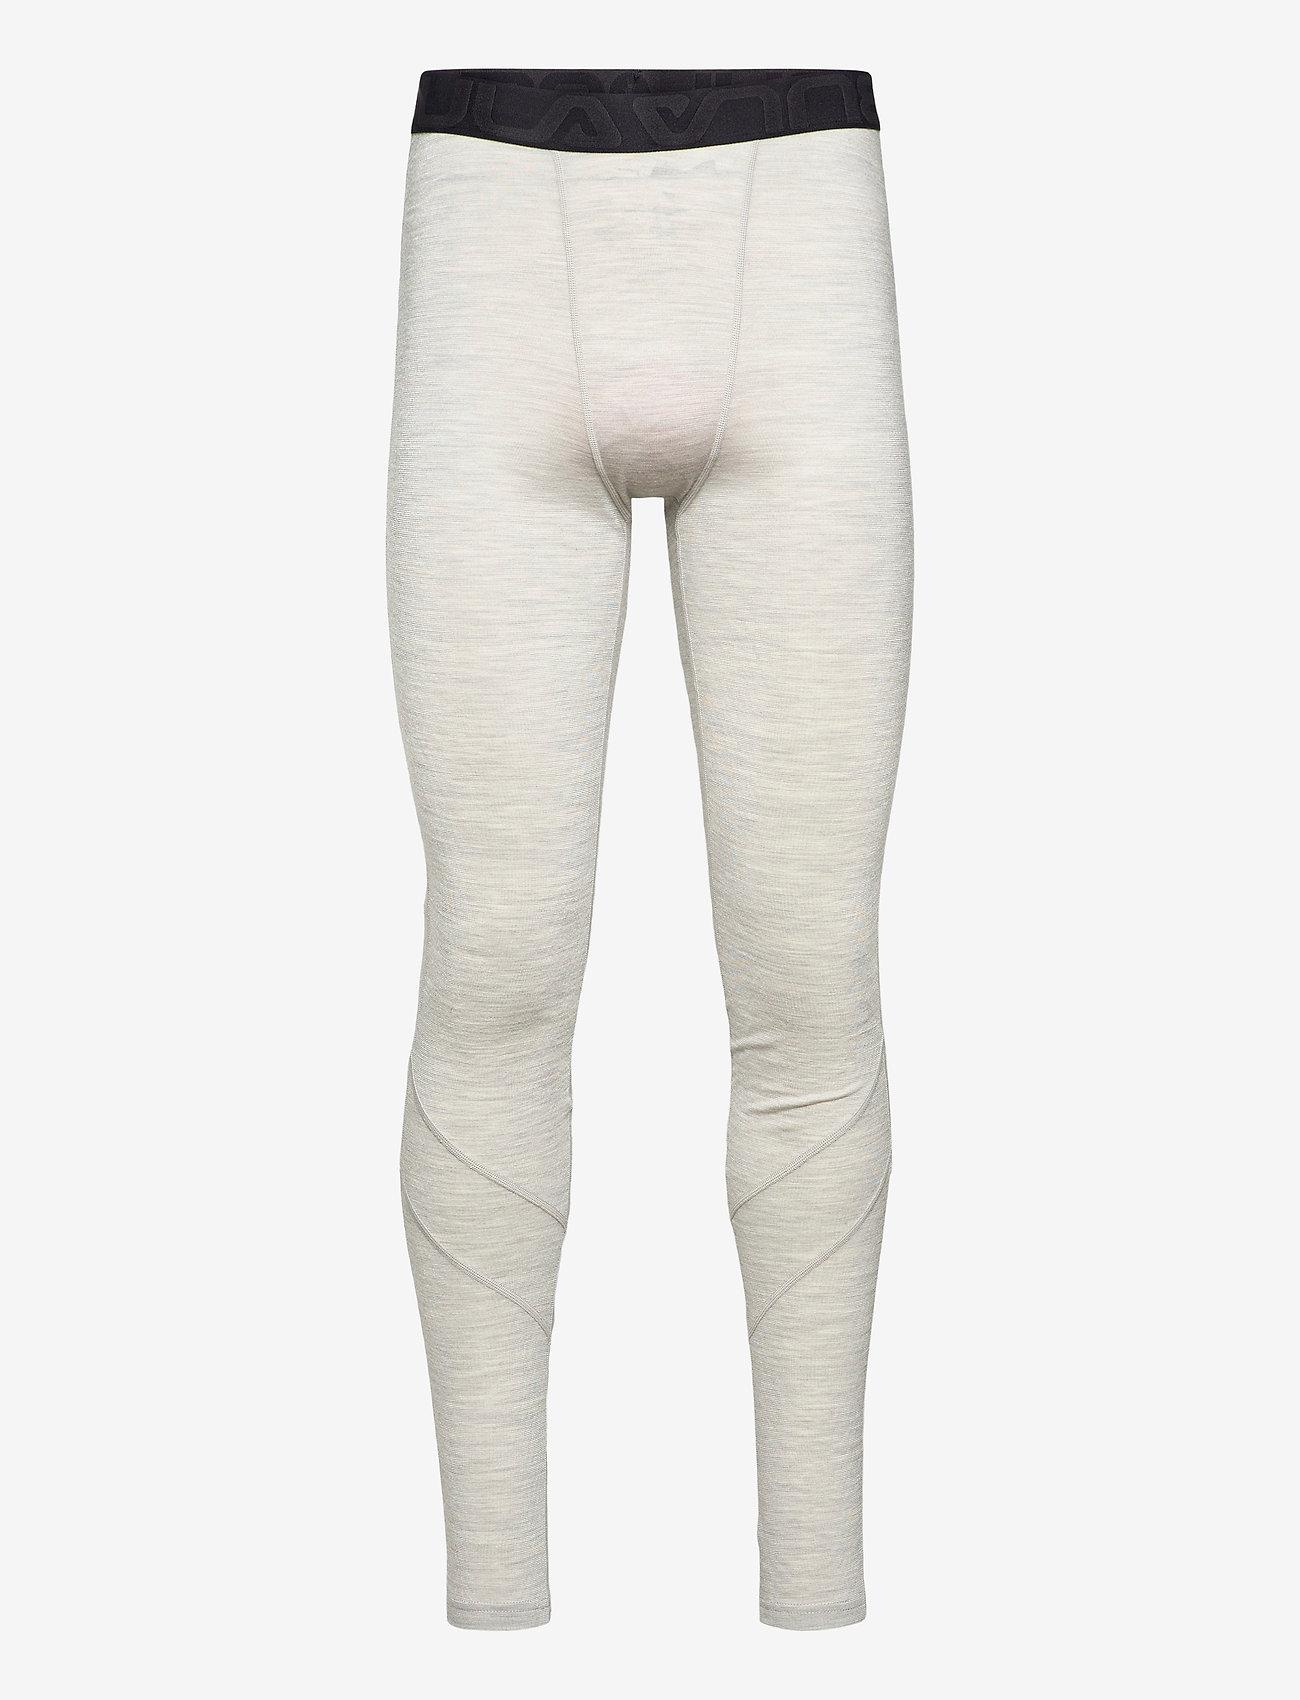 Bula - Retro wool Pants - funkionsunterwäsche - hosen - grey - 0